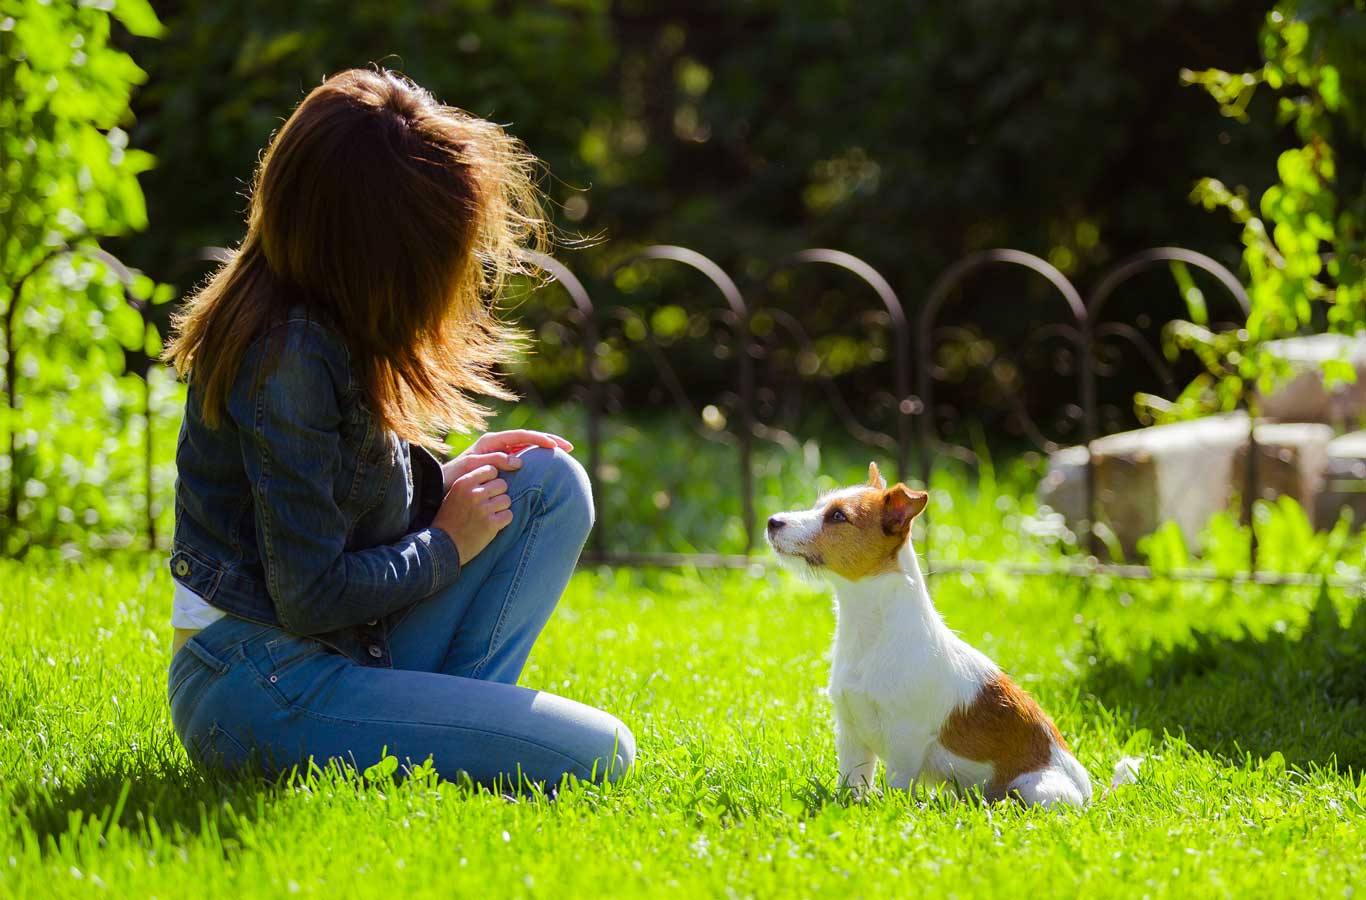 A woman trains her dog in a grassy yard